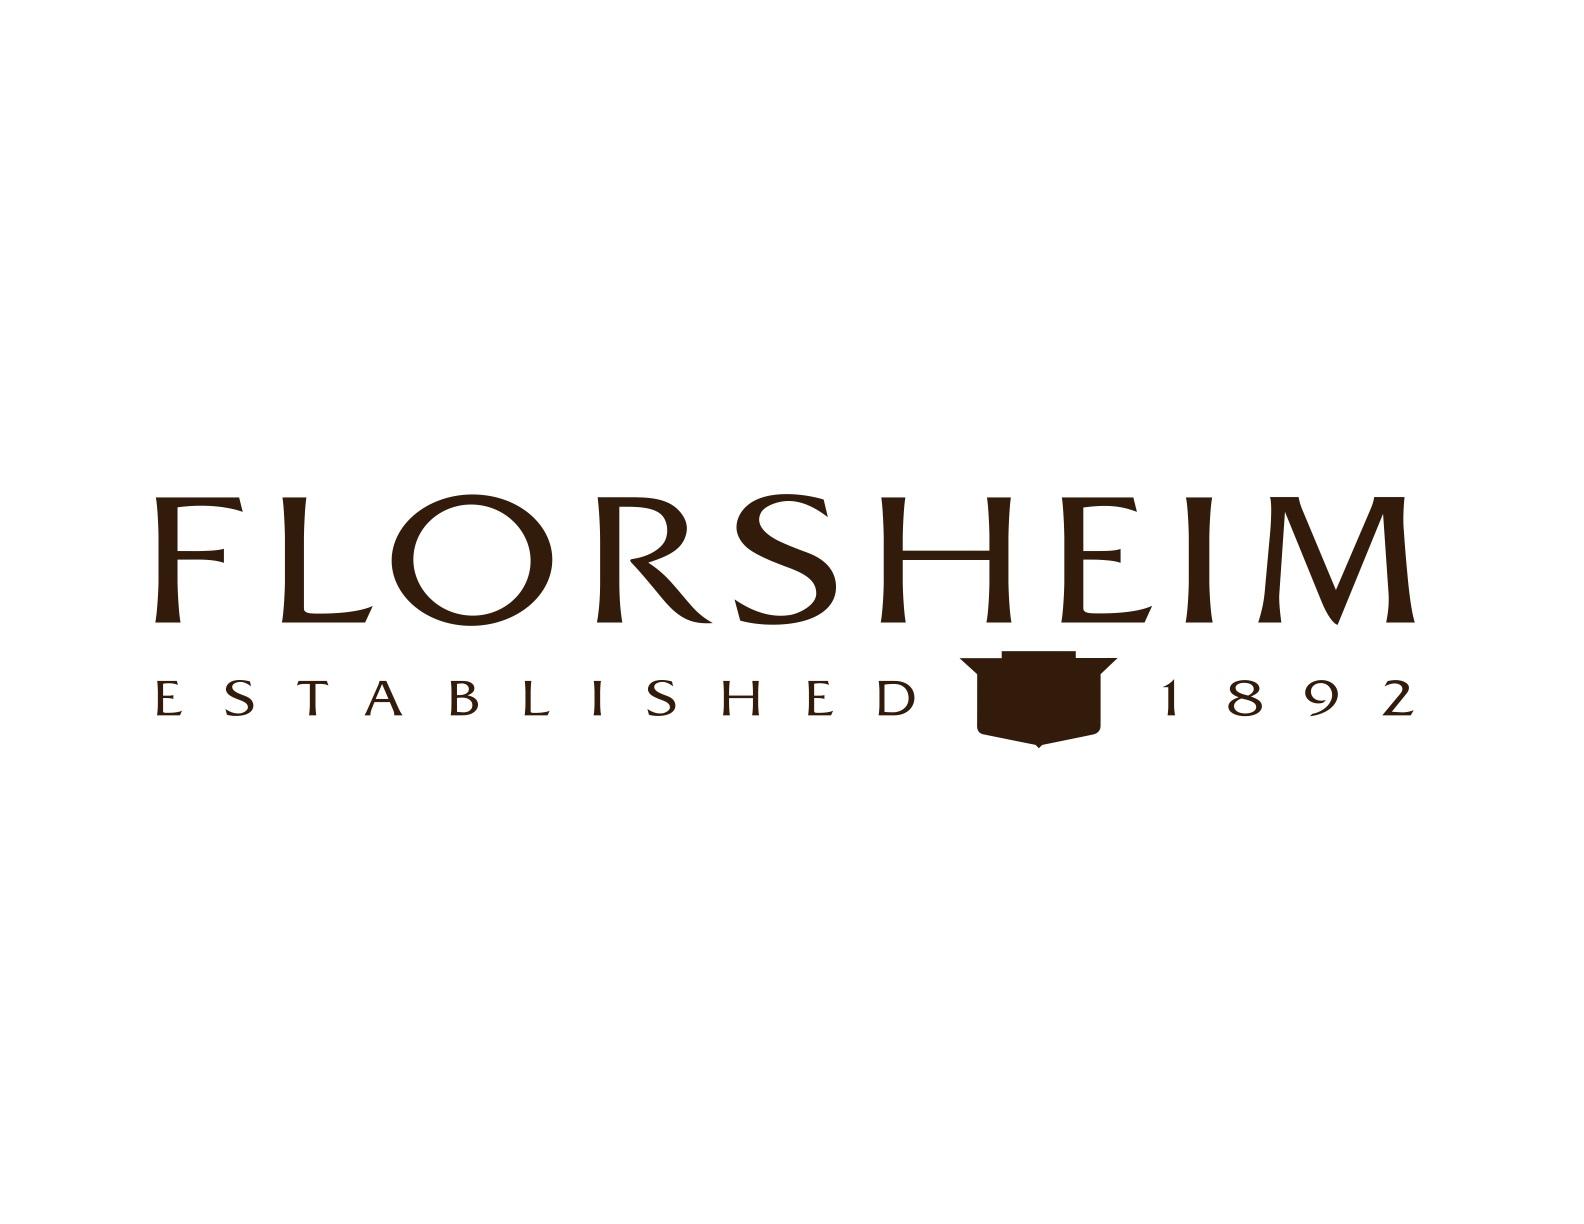 logos by jeremy espersen at coroflotcom